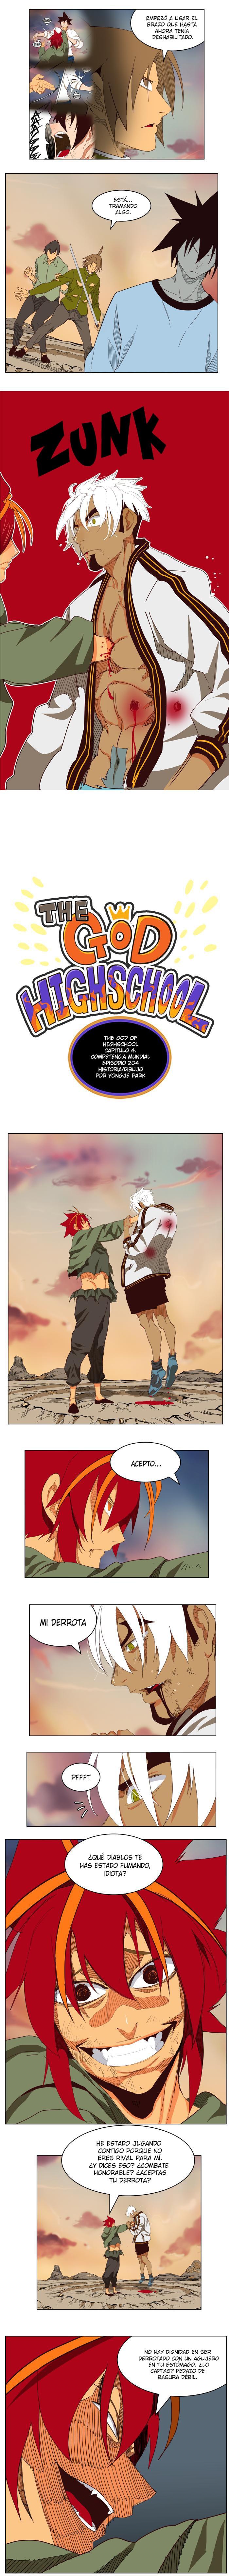 http://c5.ninemanga.com/es_manga/37/485/431954/35850f0af0027e582a418ab9e9298a9c.jpg Page 4